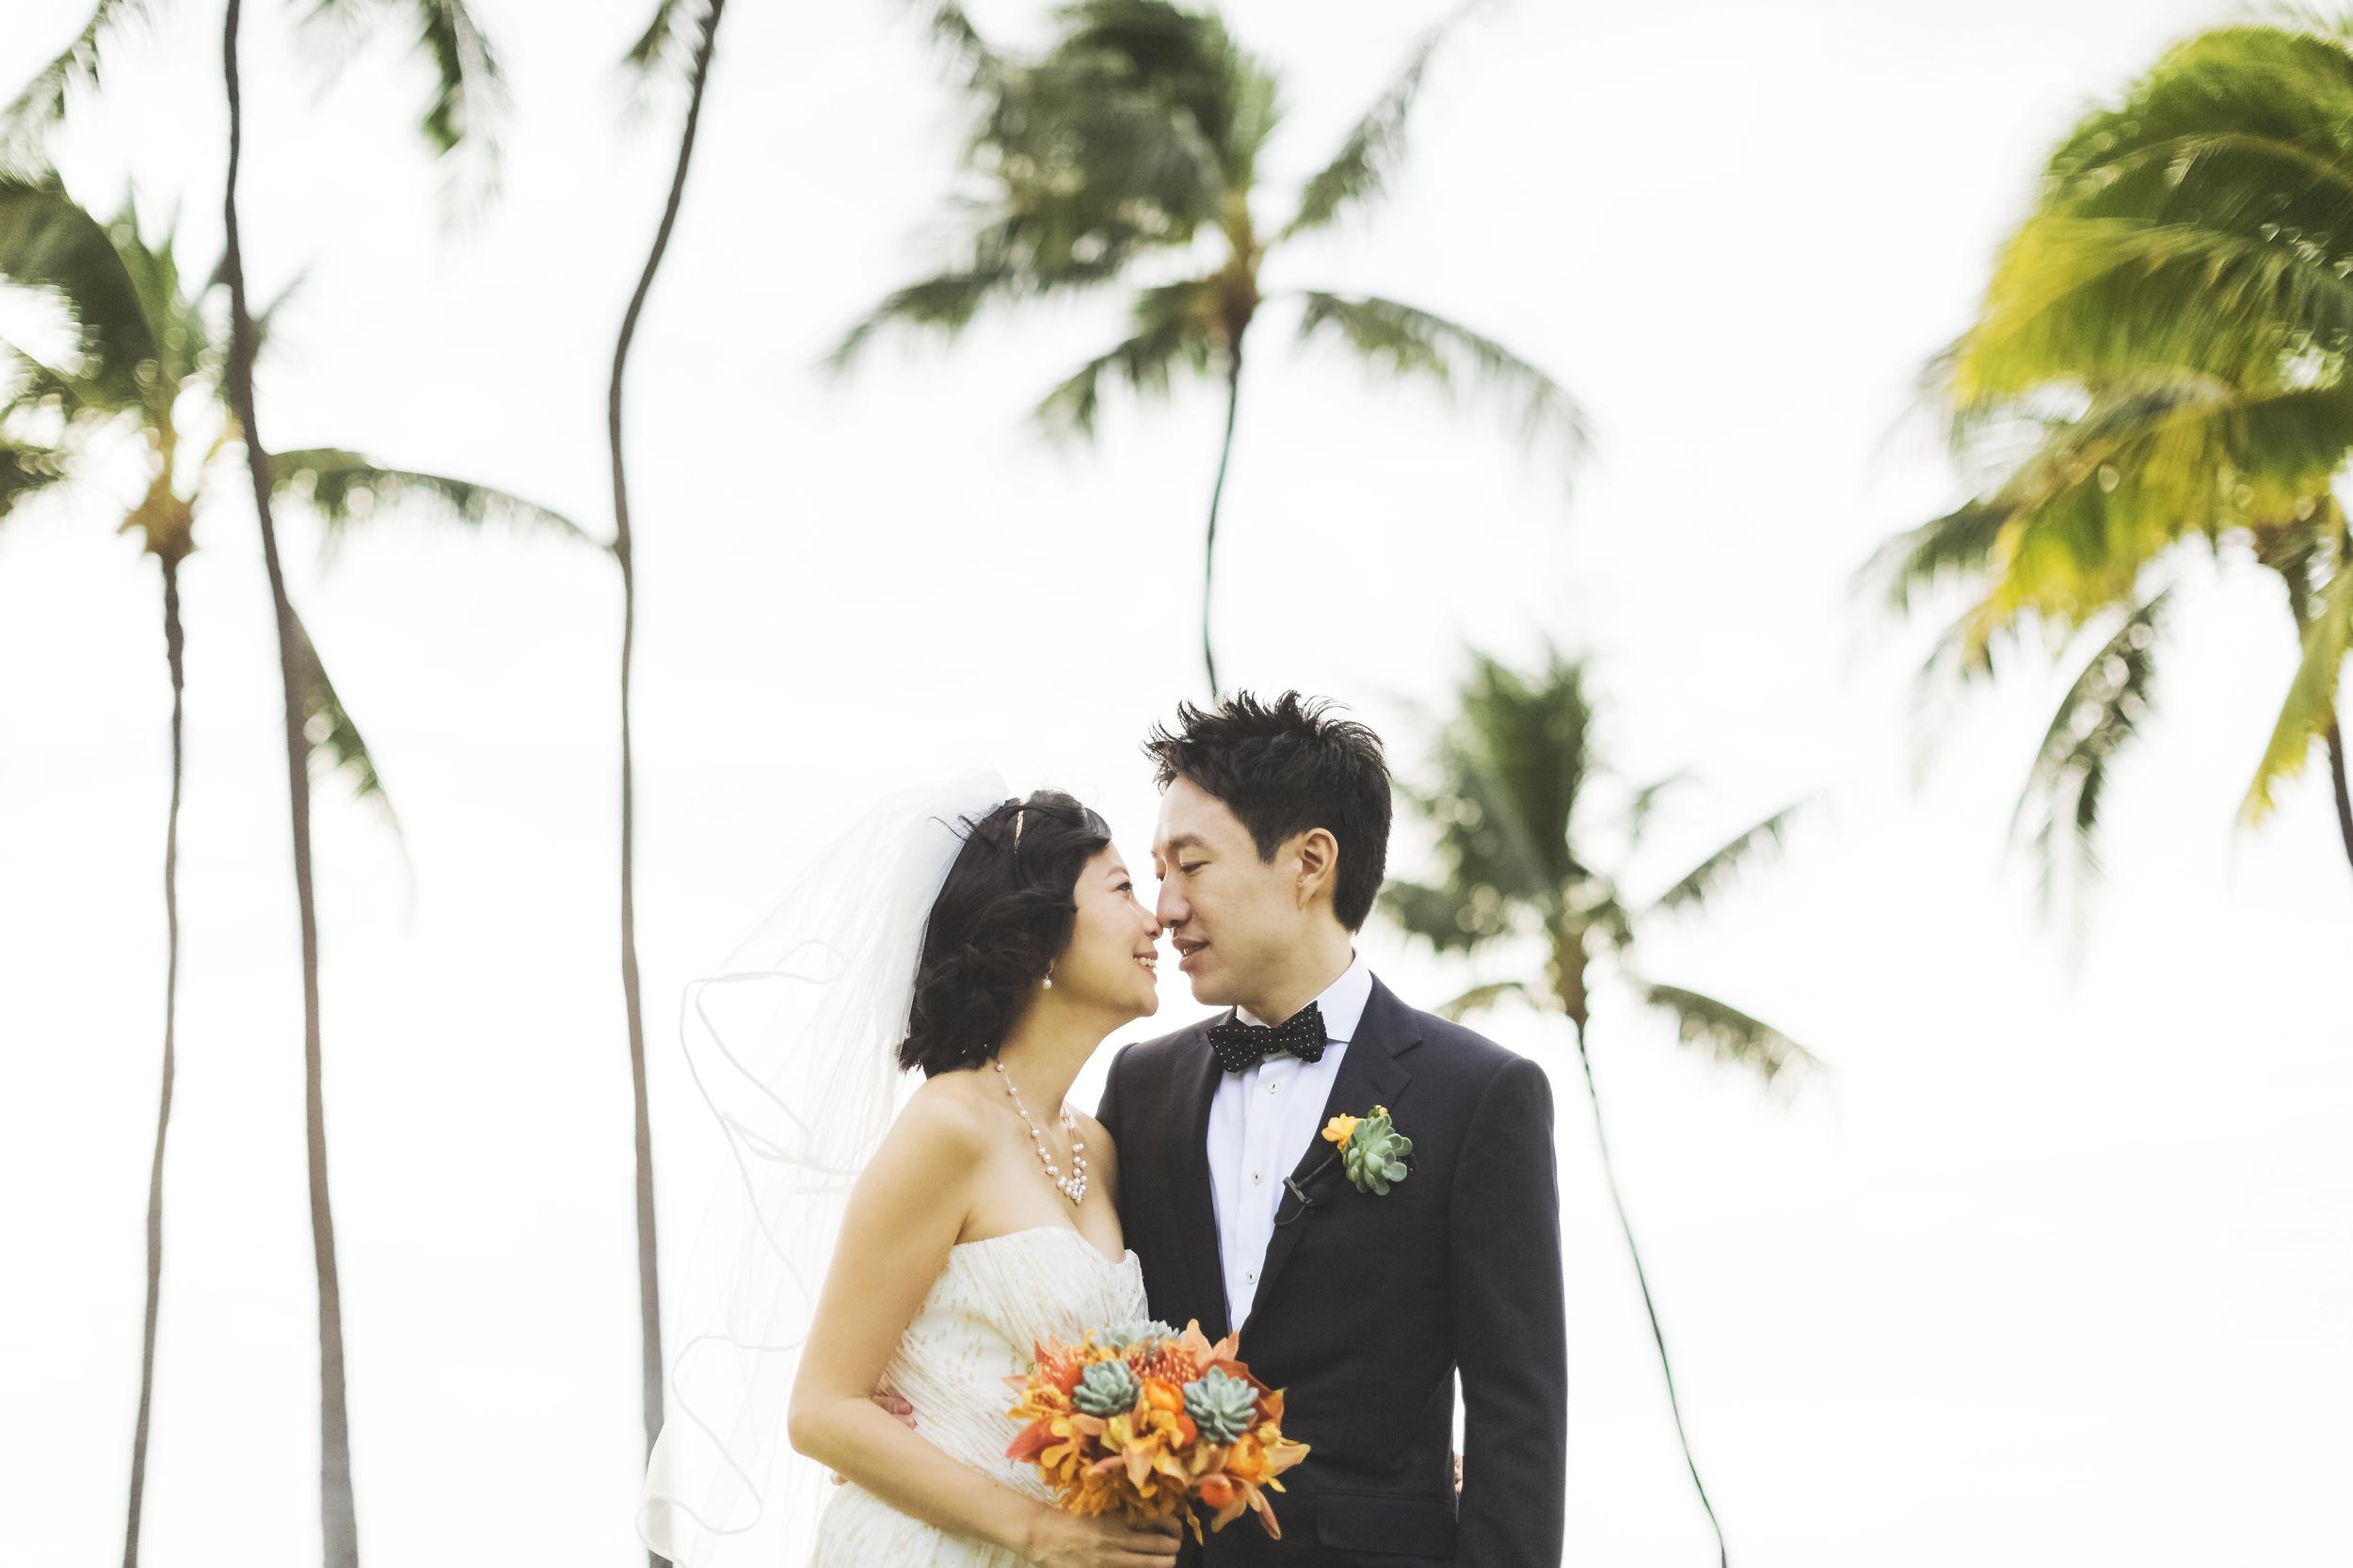 angie-diaz-photography-oahu-wedding-lanikuhonoa-shenshen-marshall-52.jpg